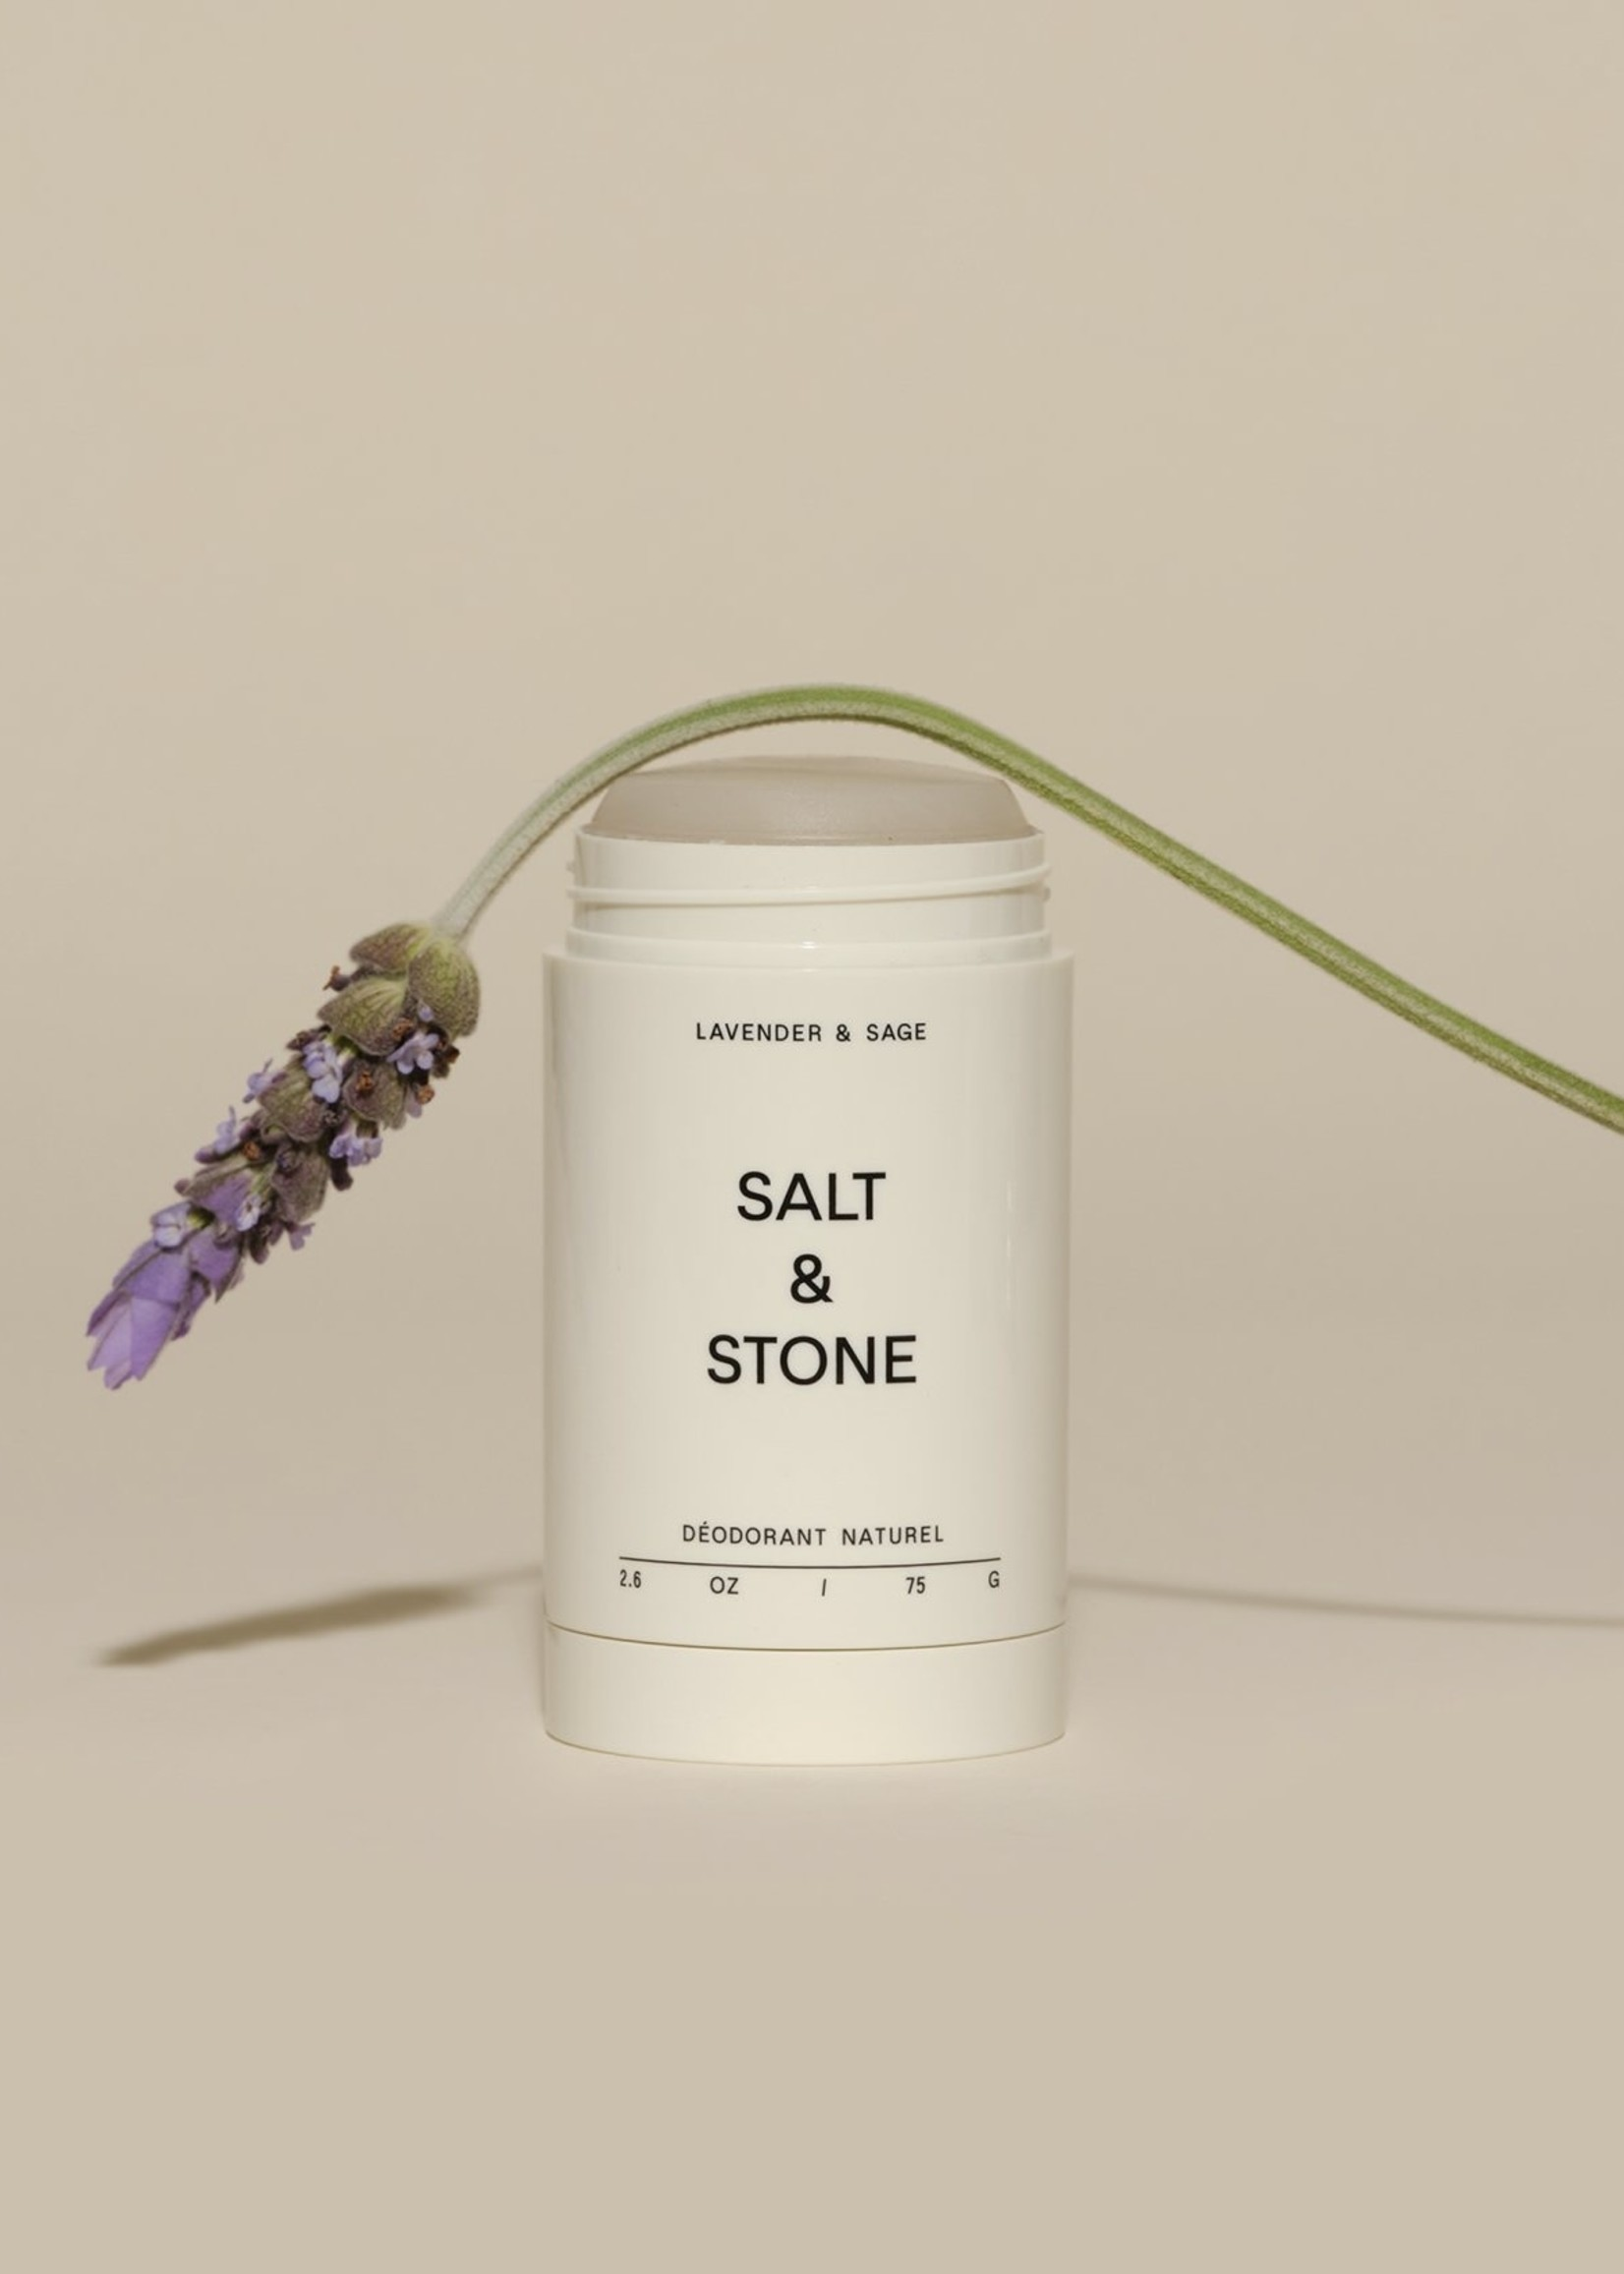 SALT & STONE Lavender & Sage Natural Deodorant